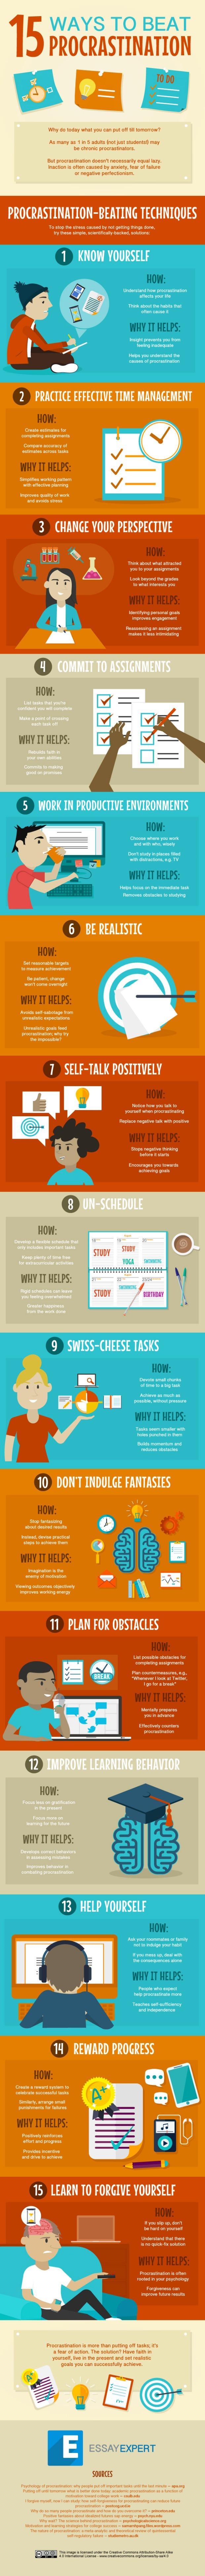 1417534655-15-ways-overcome-procrastination-get-stuff-done-infographic